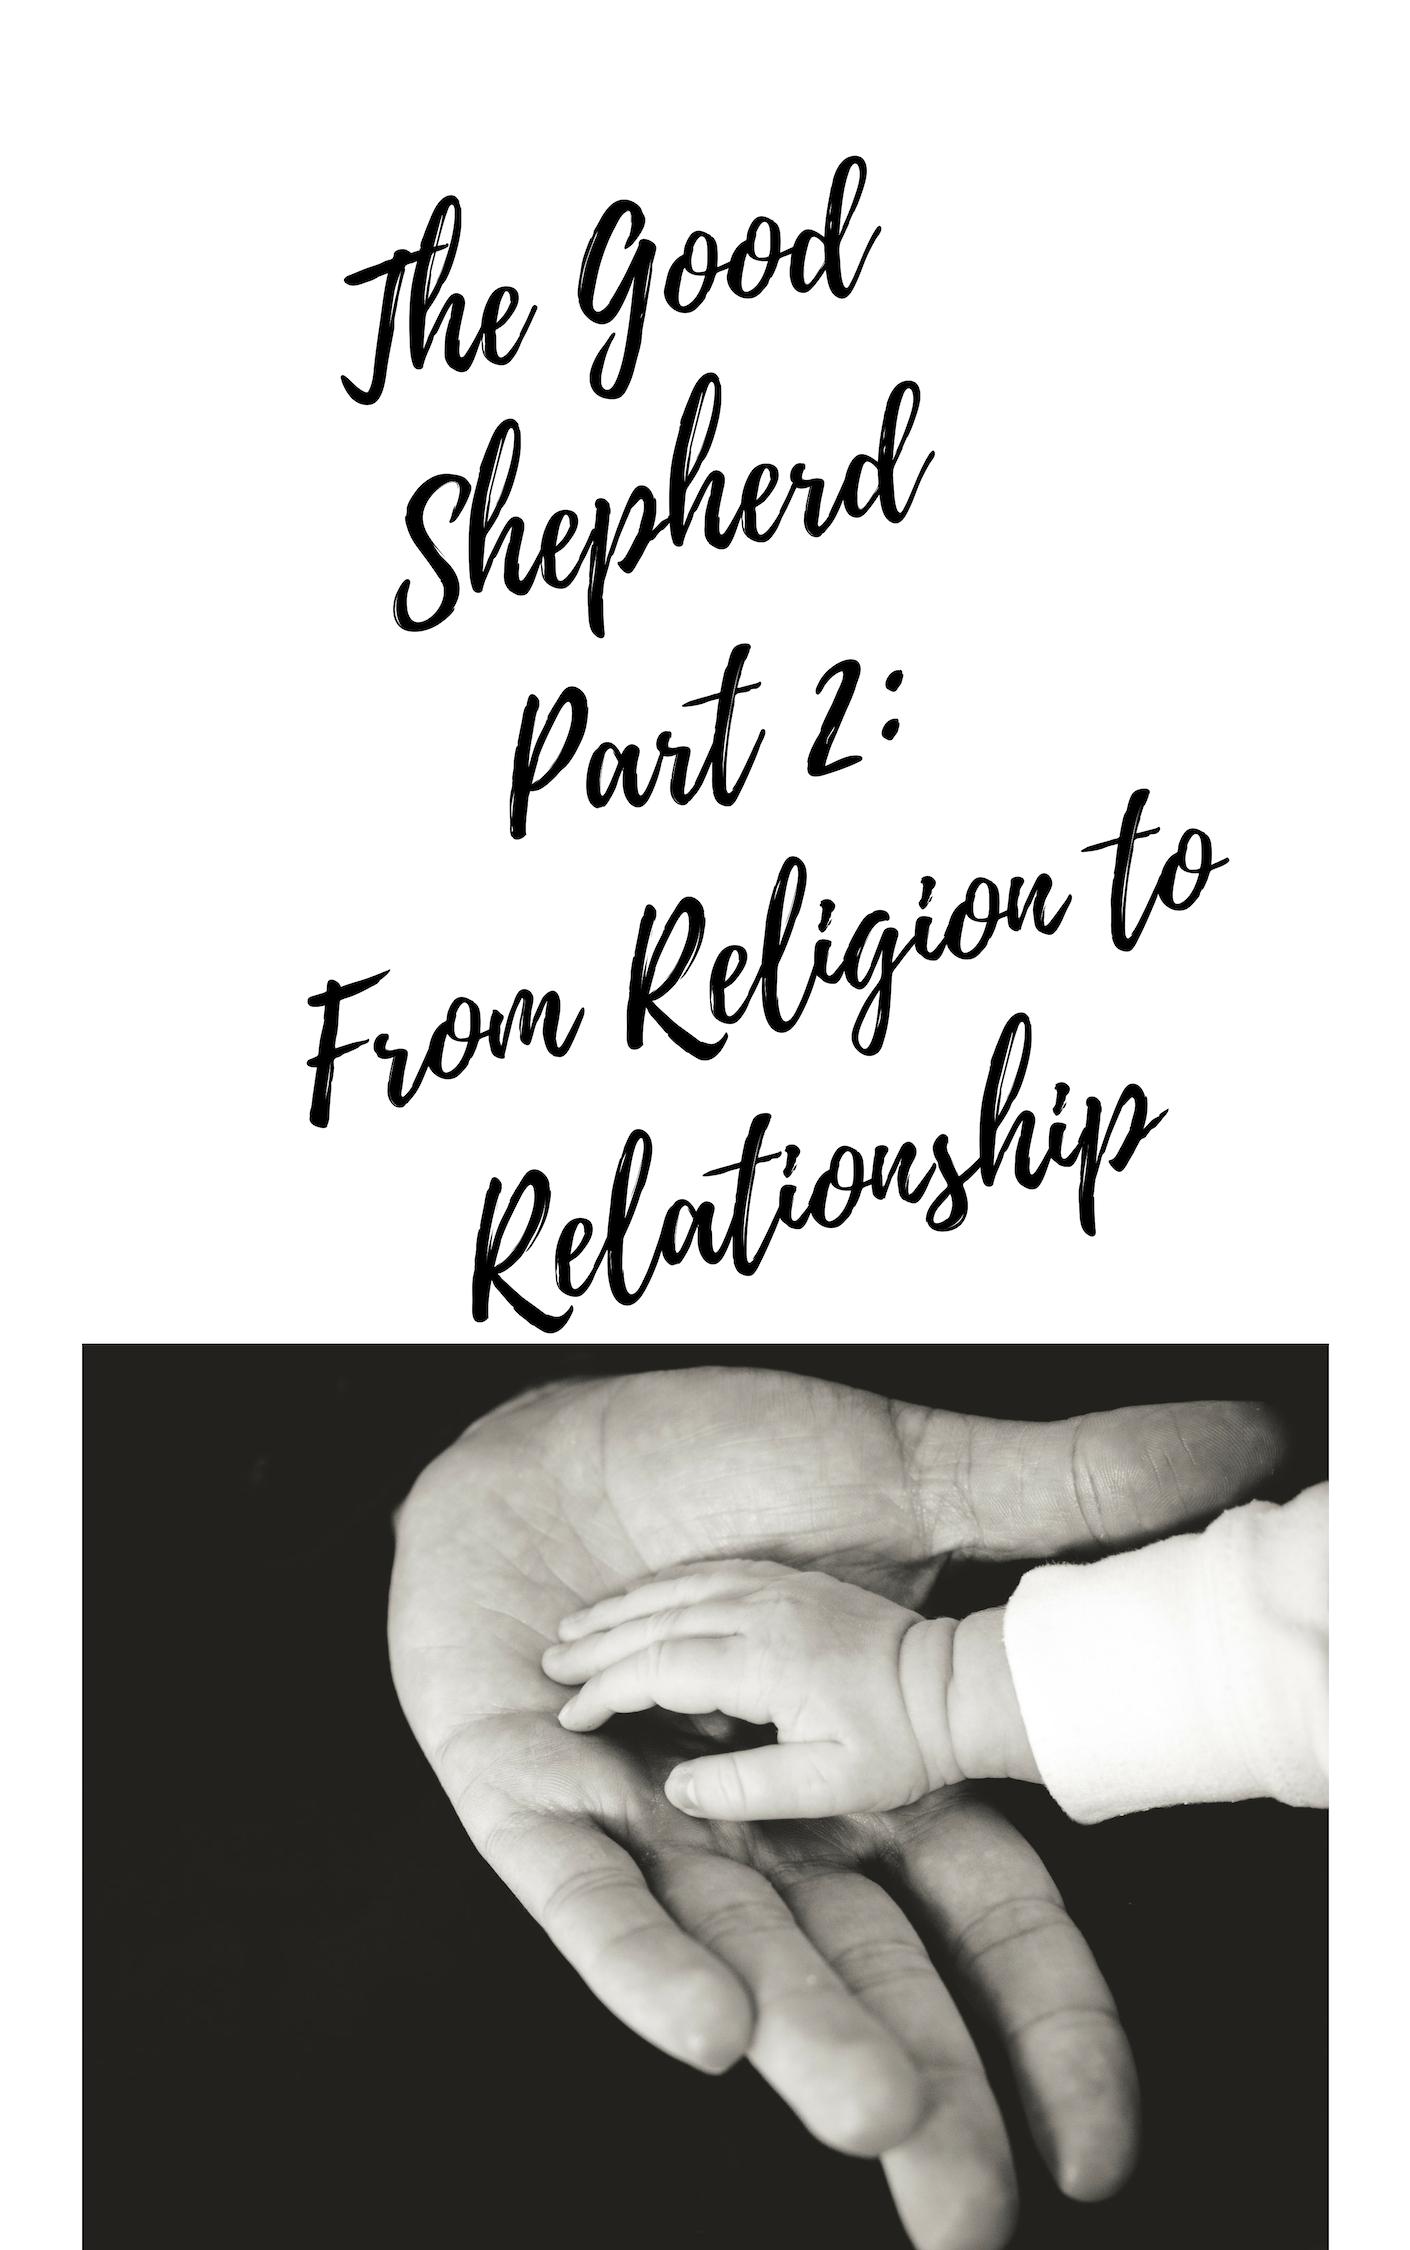 The Good Shepherd Part 2_ From Religion to Relationship.jpg